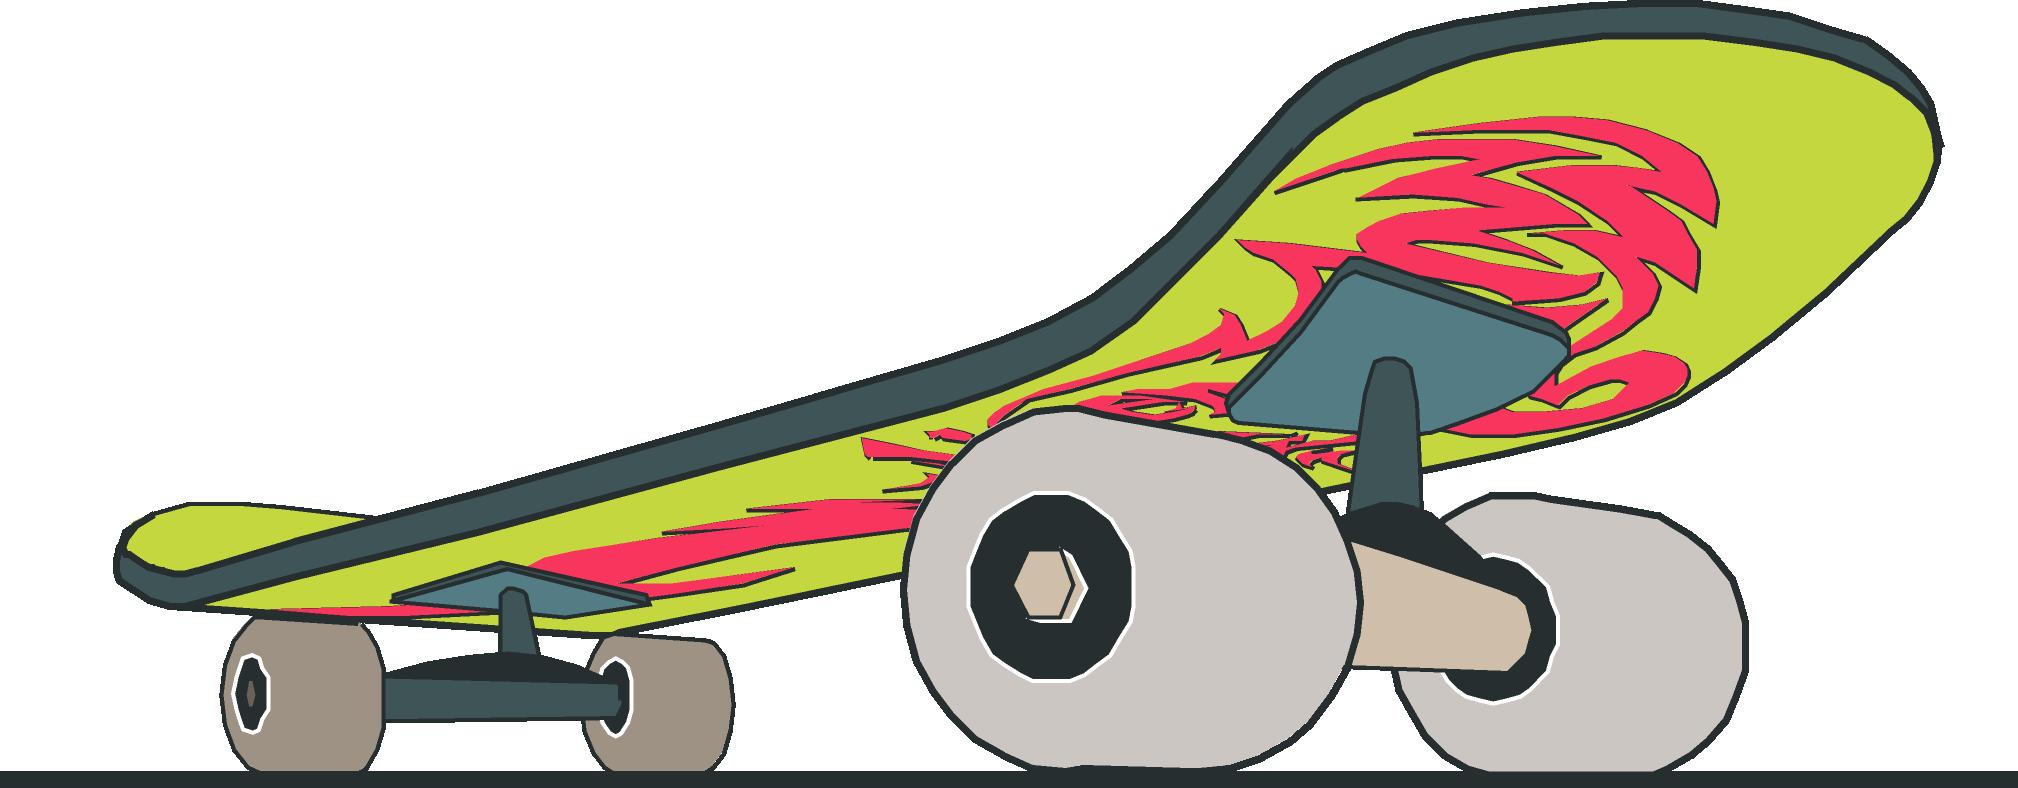 Skateboard clipart image